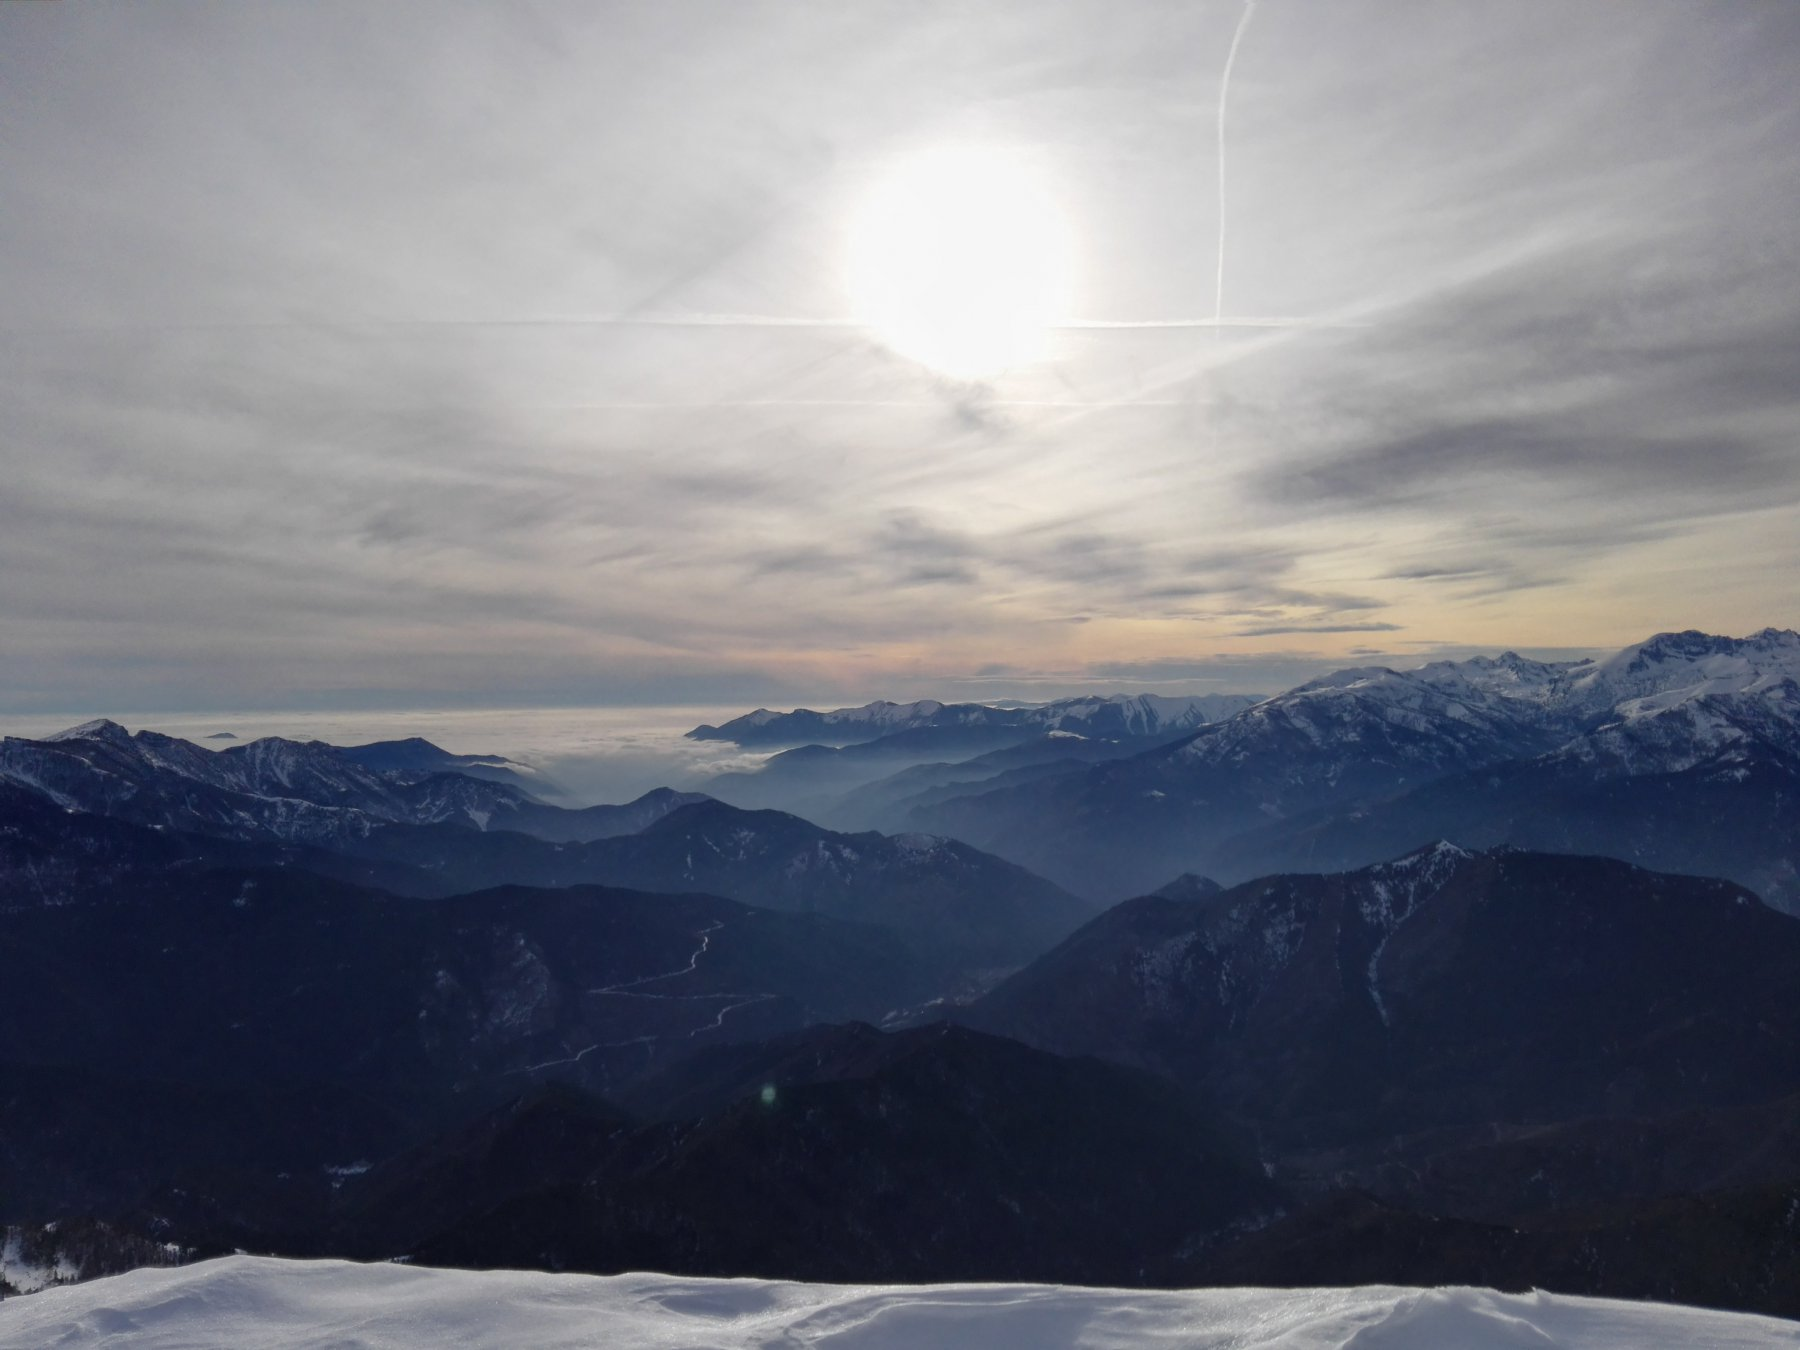 Uno sguardo verso la Costa Azzurra